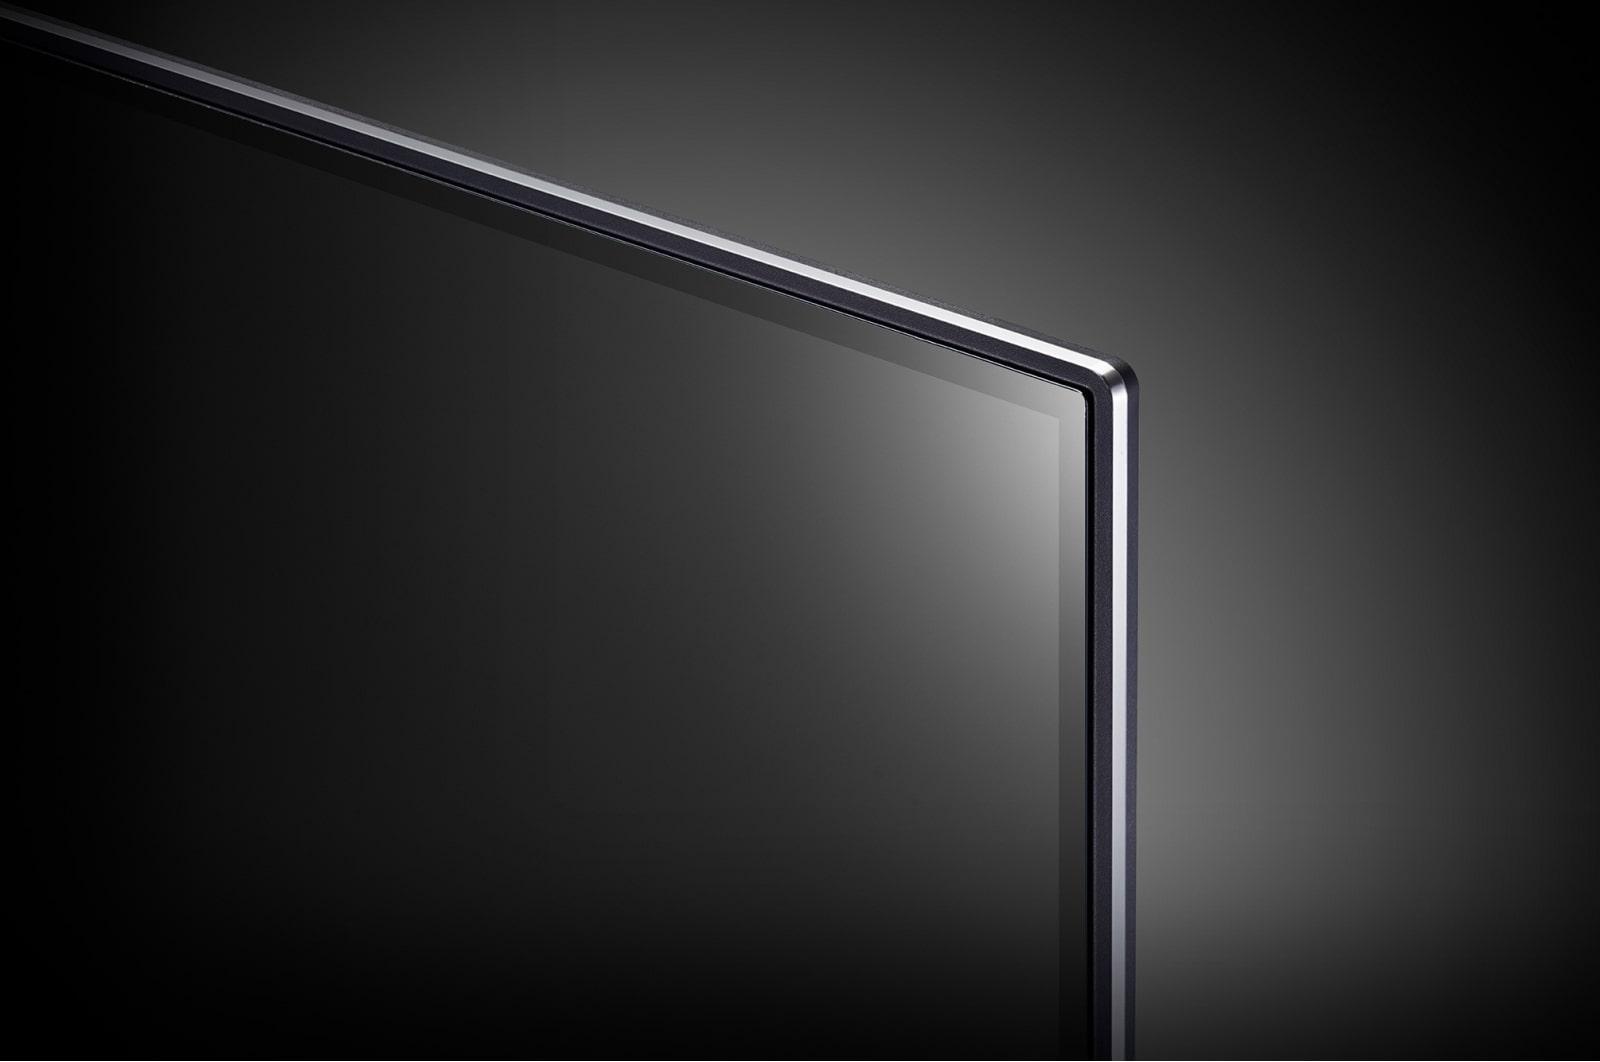 LG TV 55SK8500PTA 8